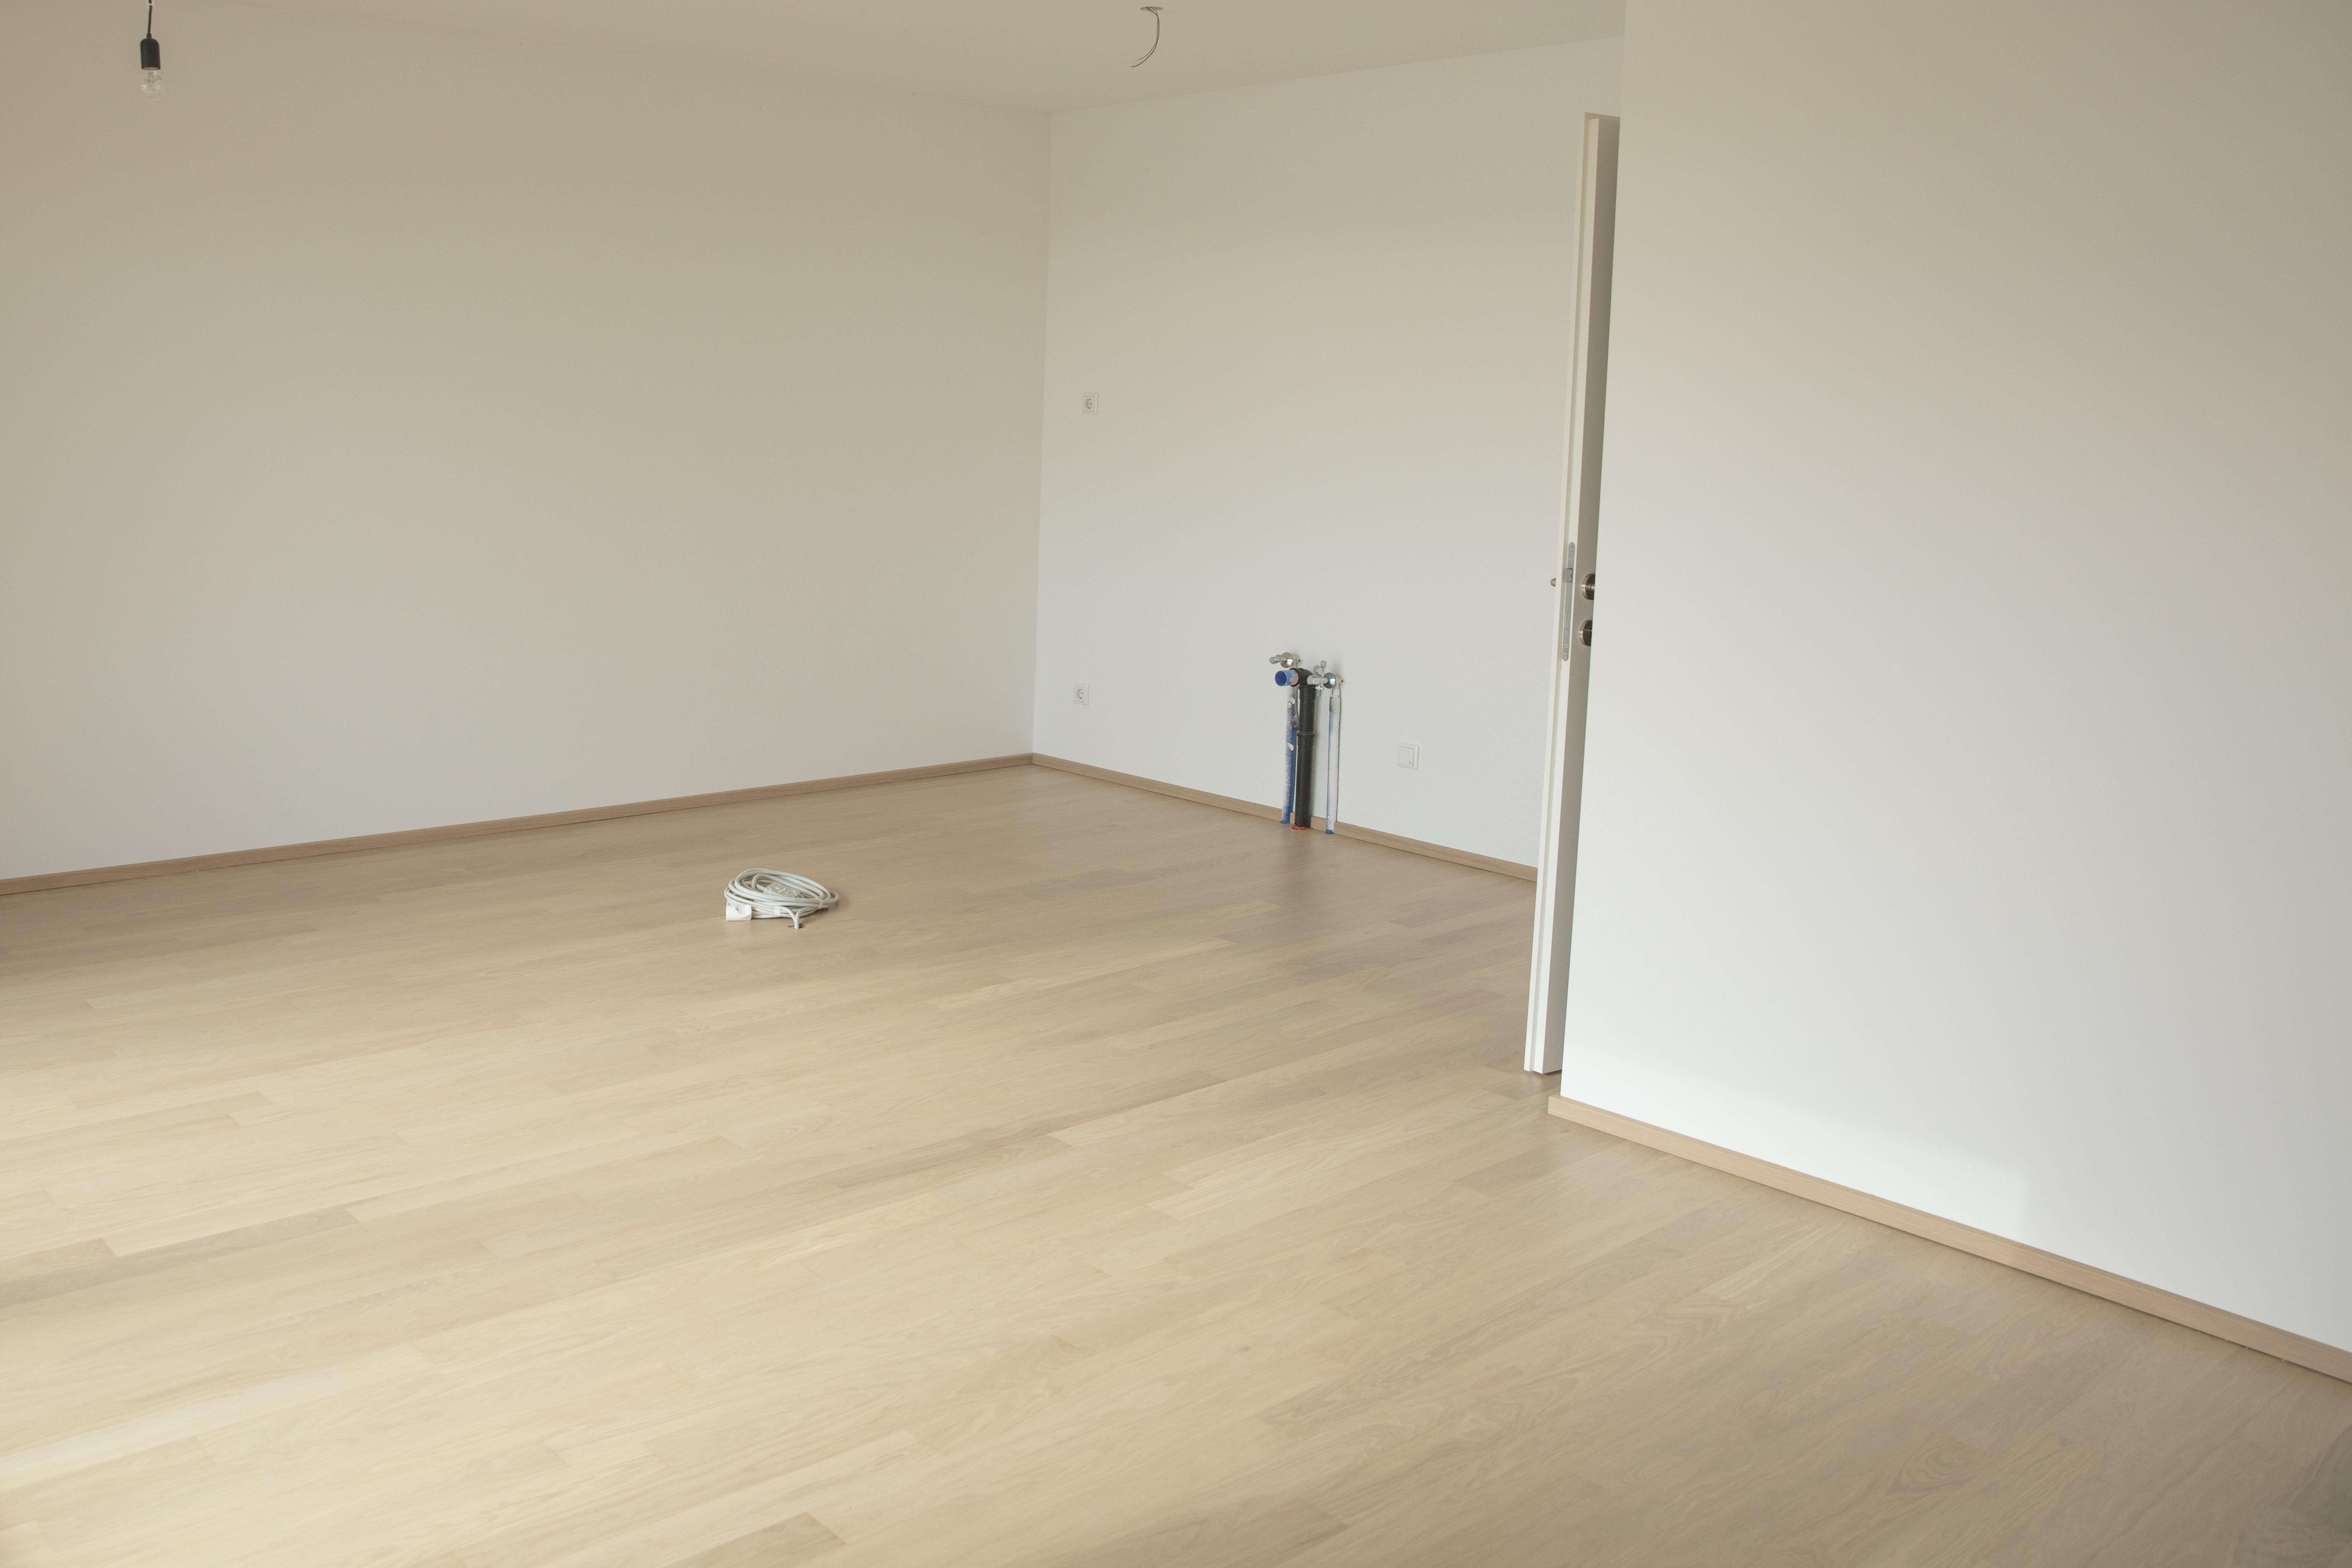 2230 Beletage Eigentumswohnung